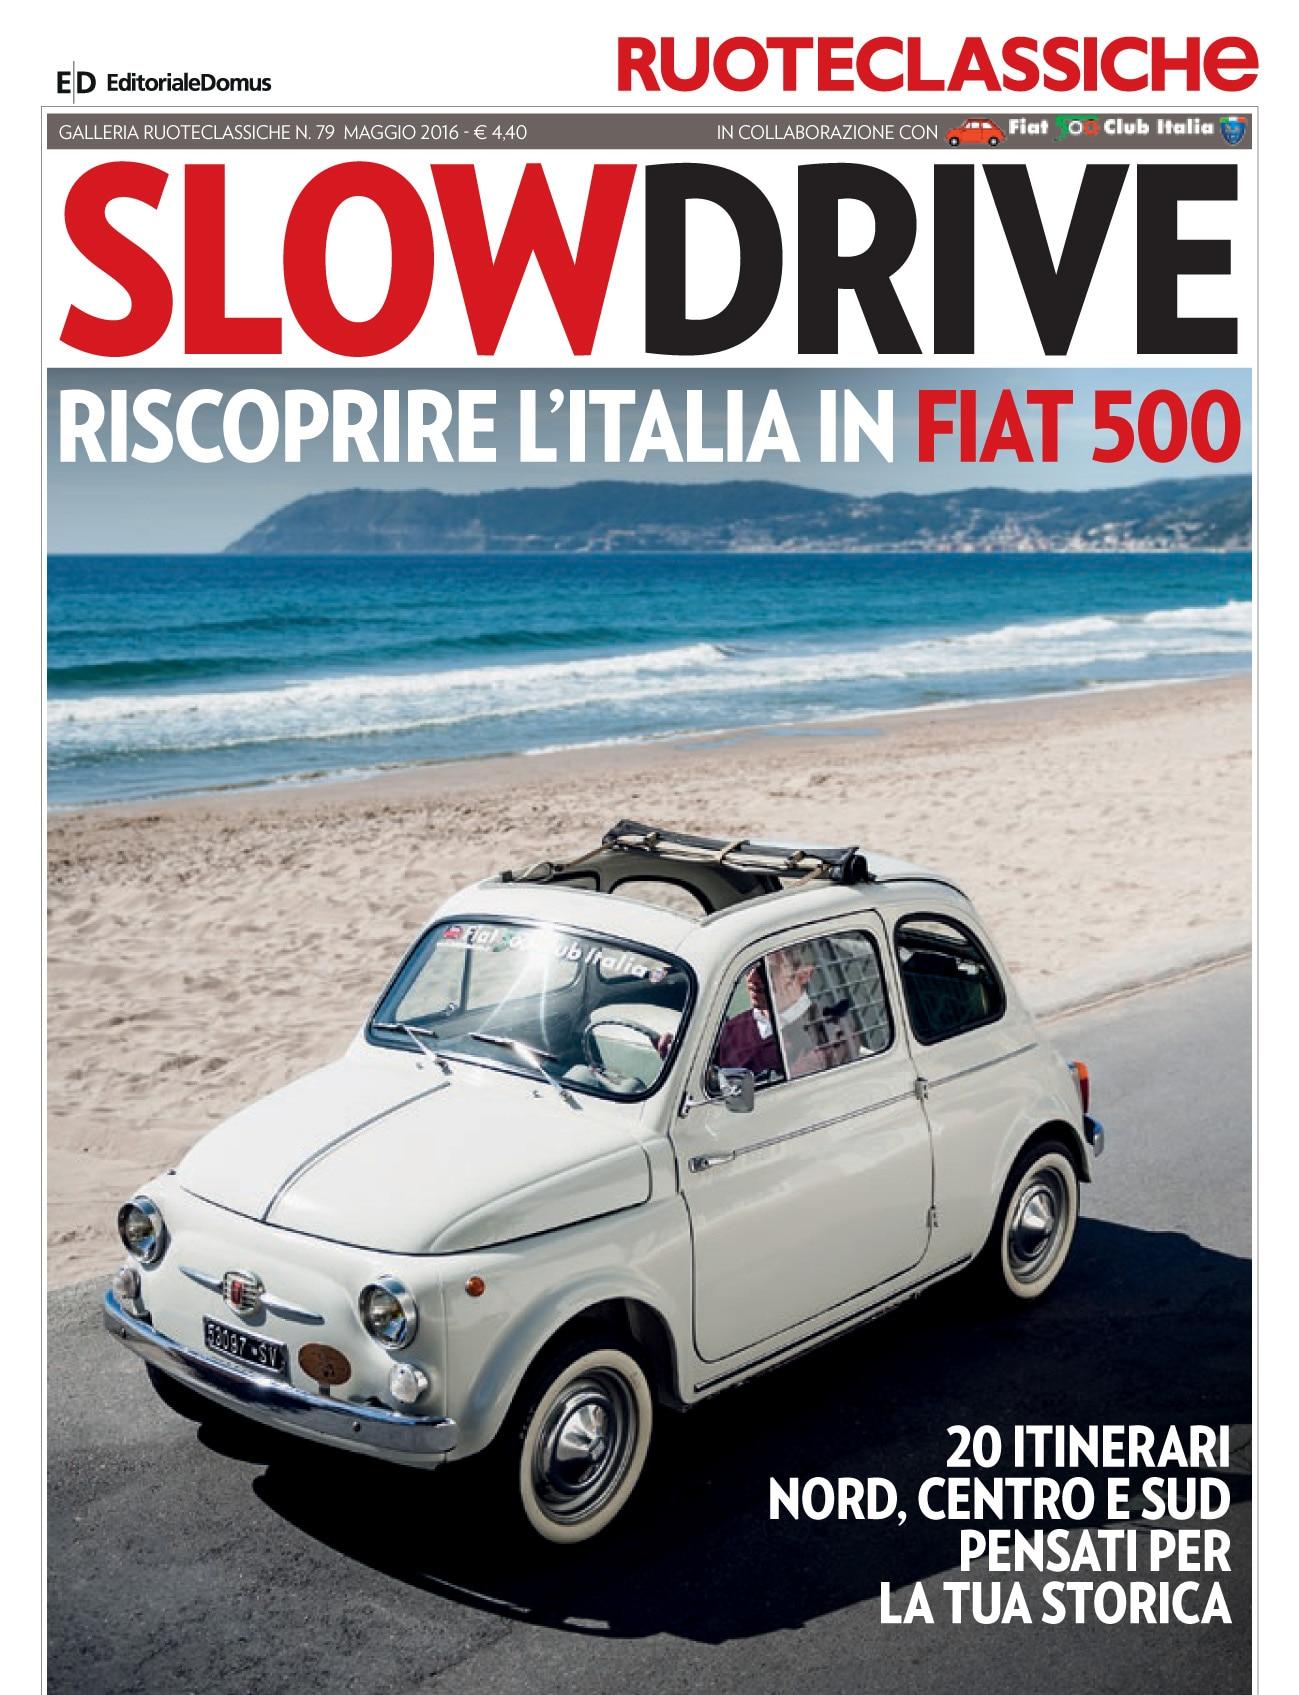 RCL Slowdrive copertina copiaOK